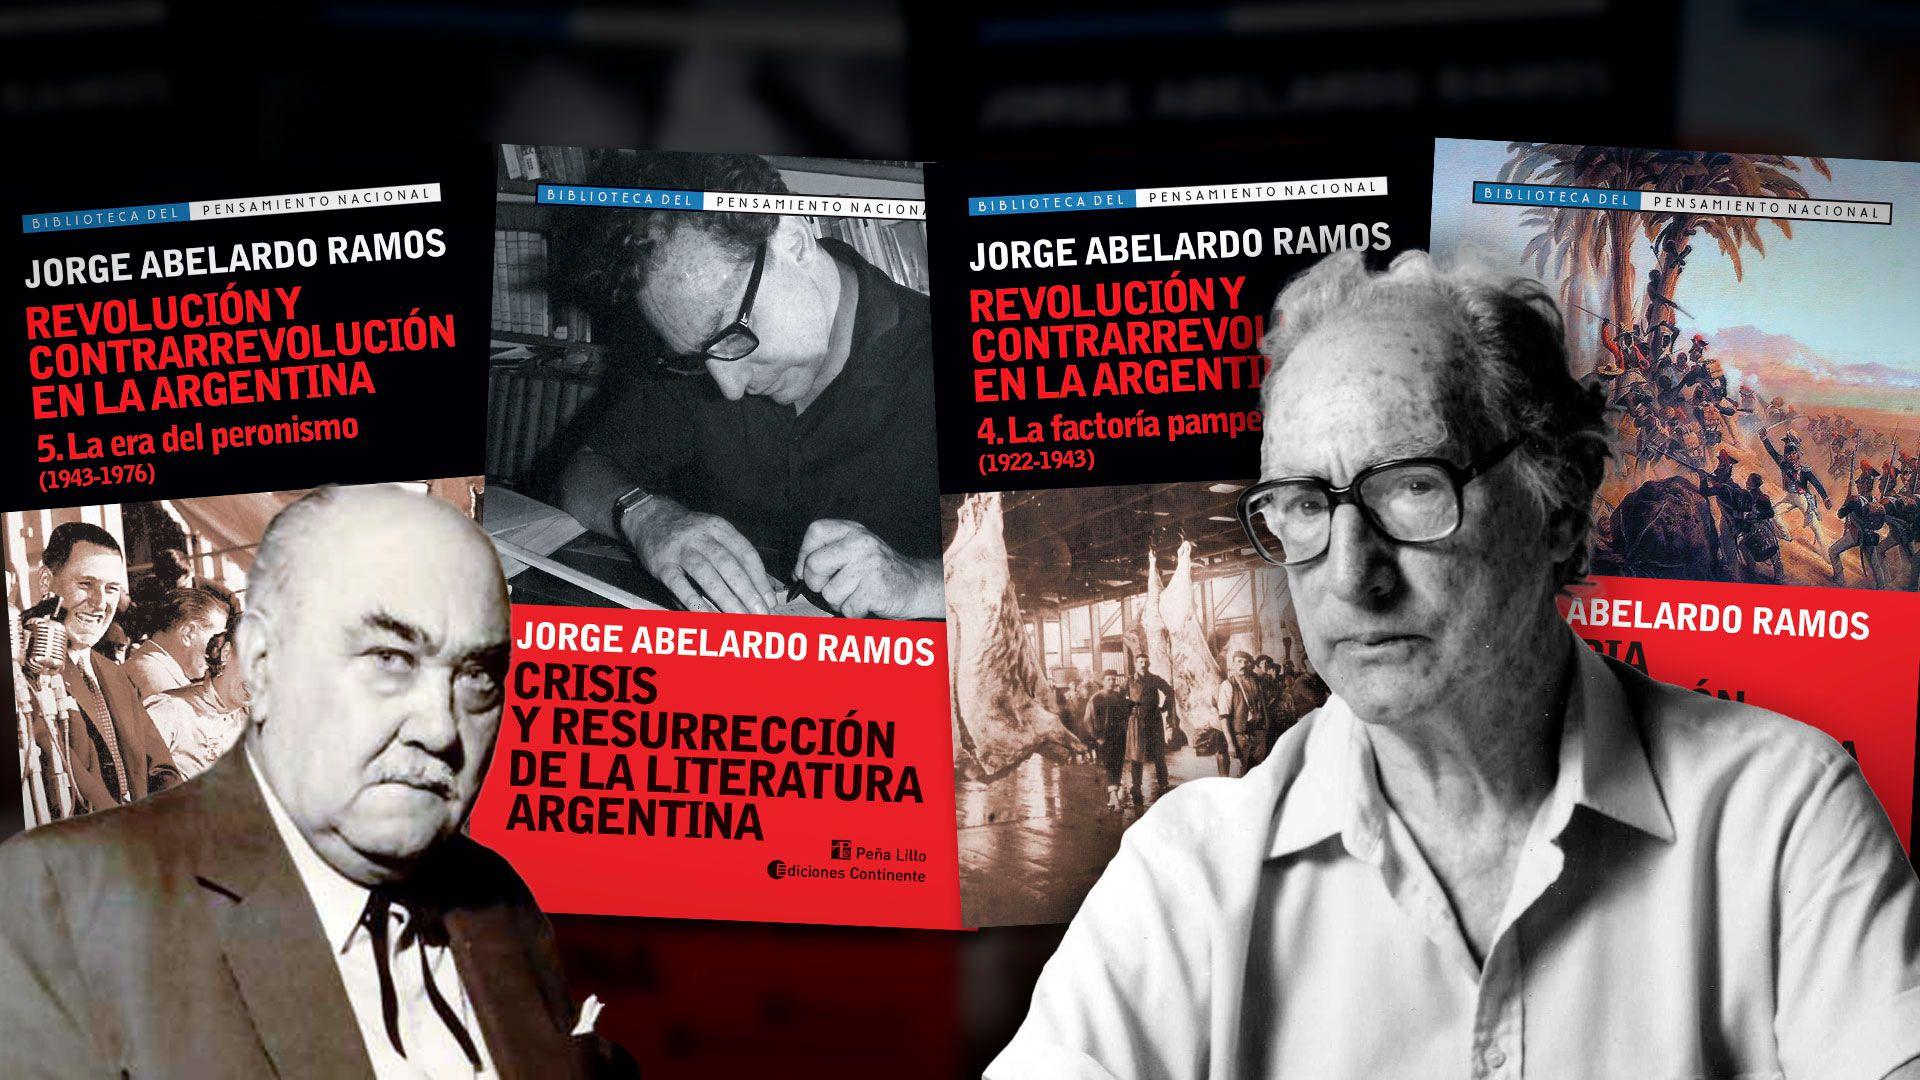 Jorge Abelardo Ramos collage portada